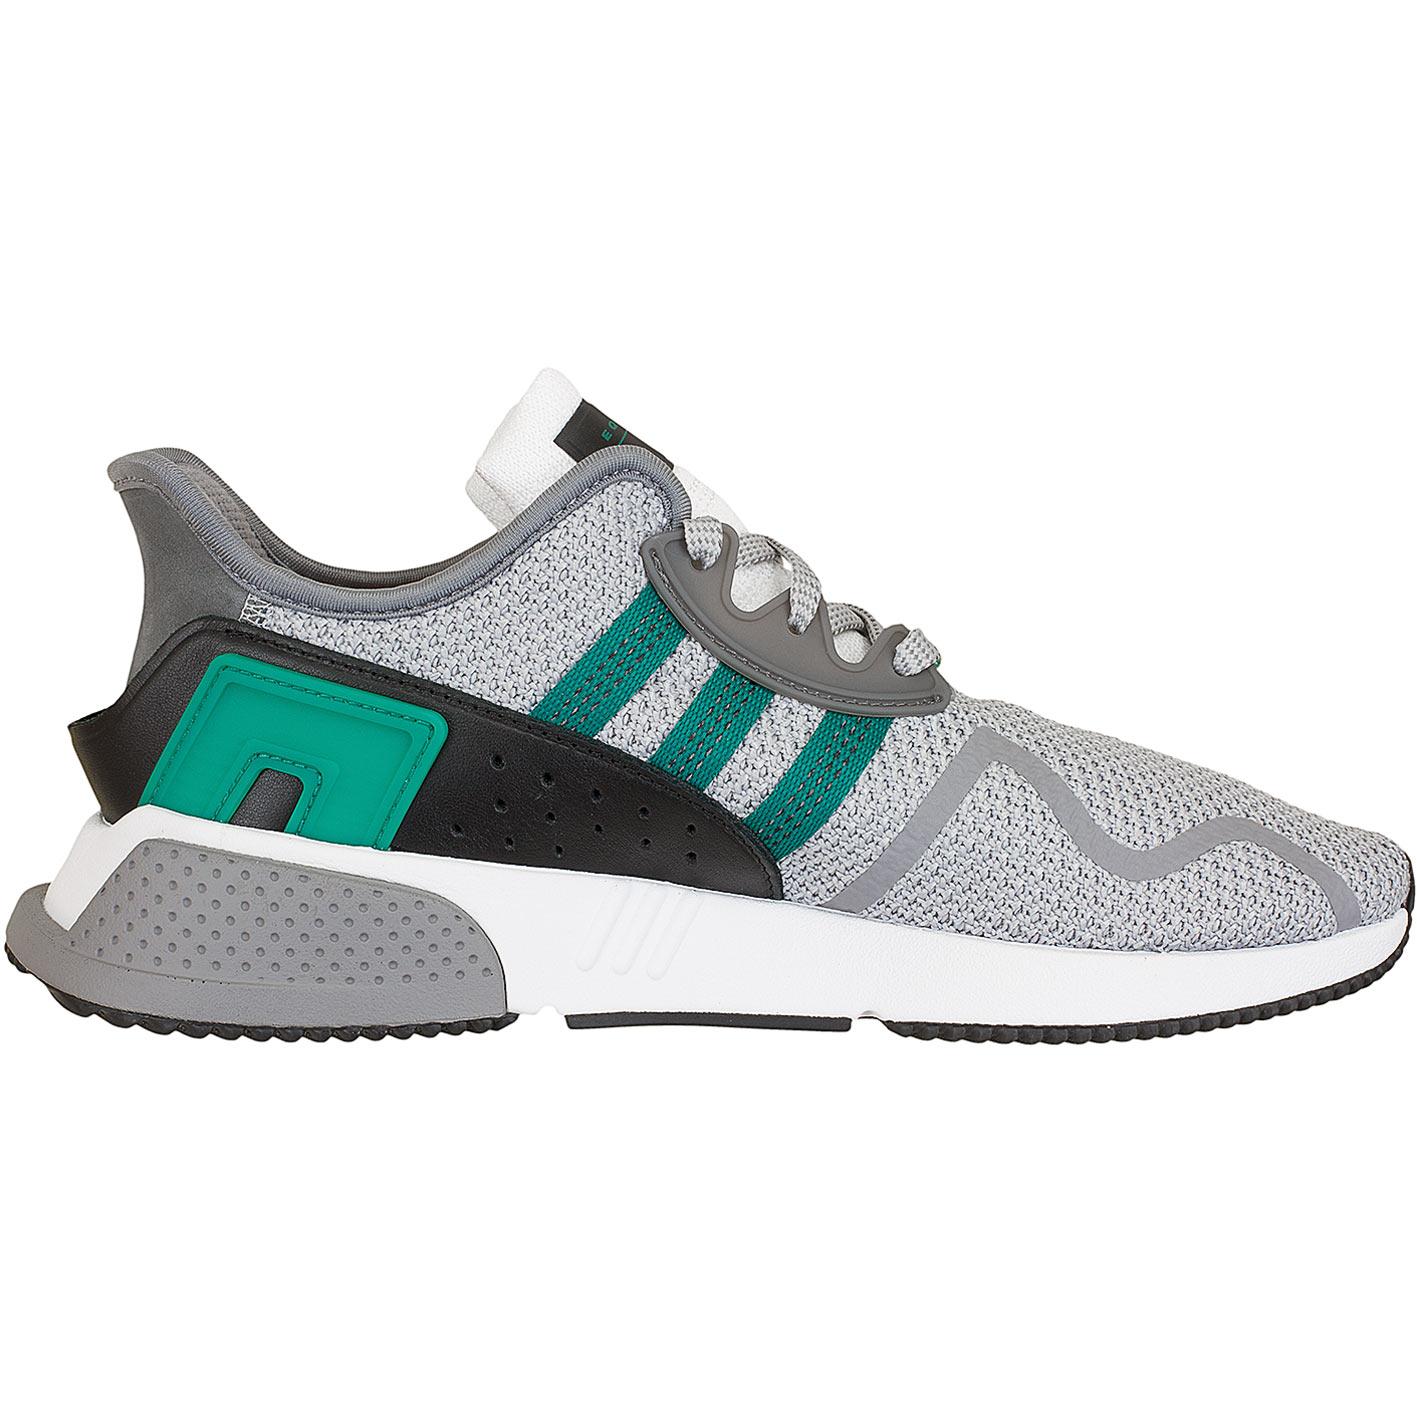 check out 58226 d754b ... release date  f18ec 933ba Adidas Originals Damen Sneaker Equipment Cushion  ADV graugrün